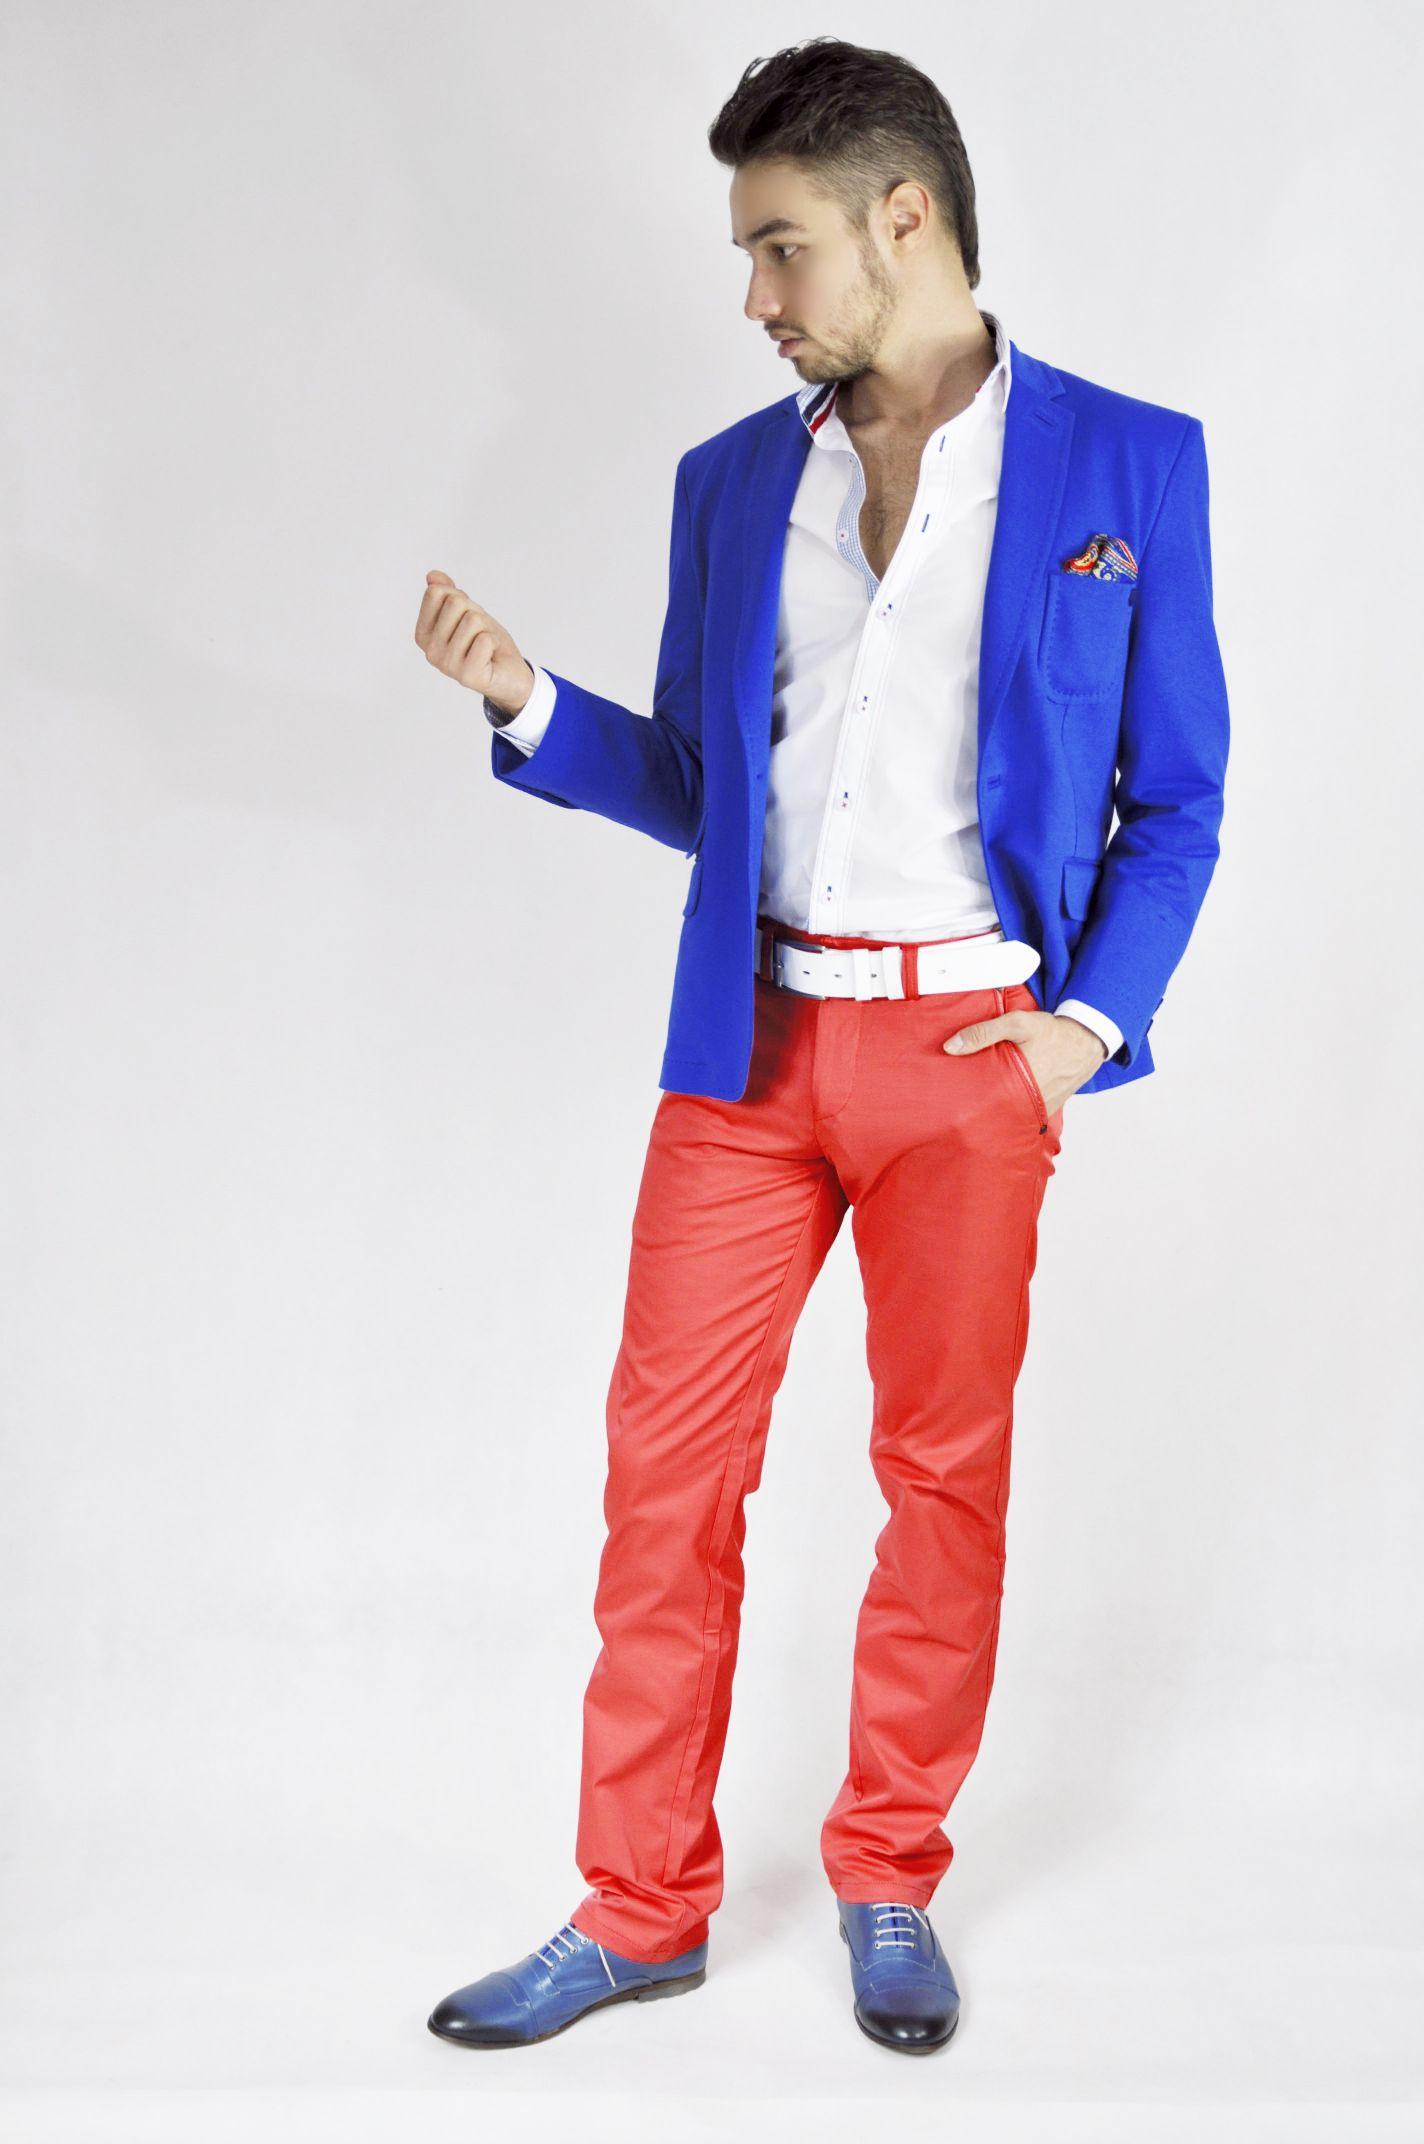 0ca1caadb9a33 spodnie-garnitur-radom-sklep_01   Salon Mody Męskiej Okey